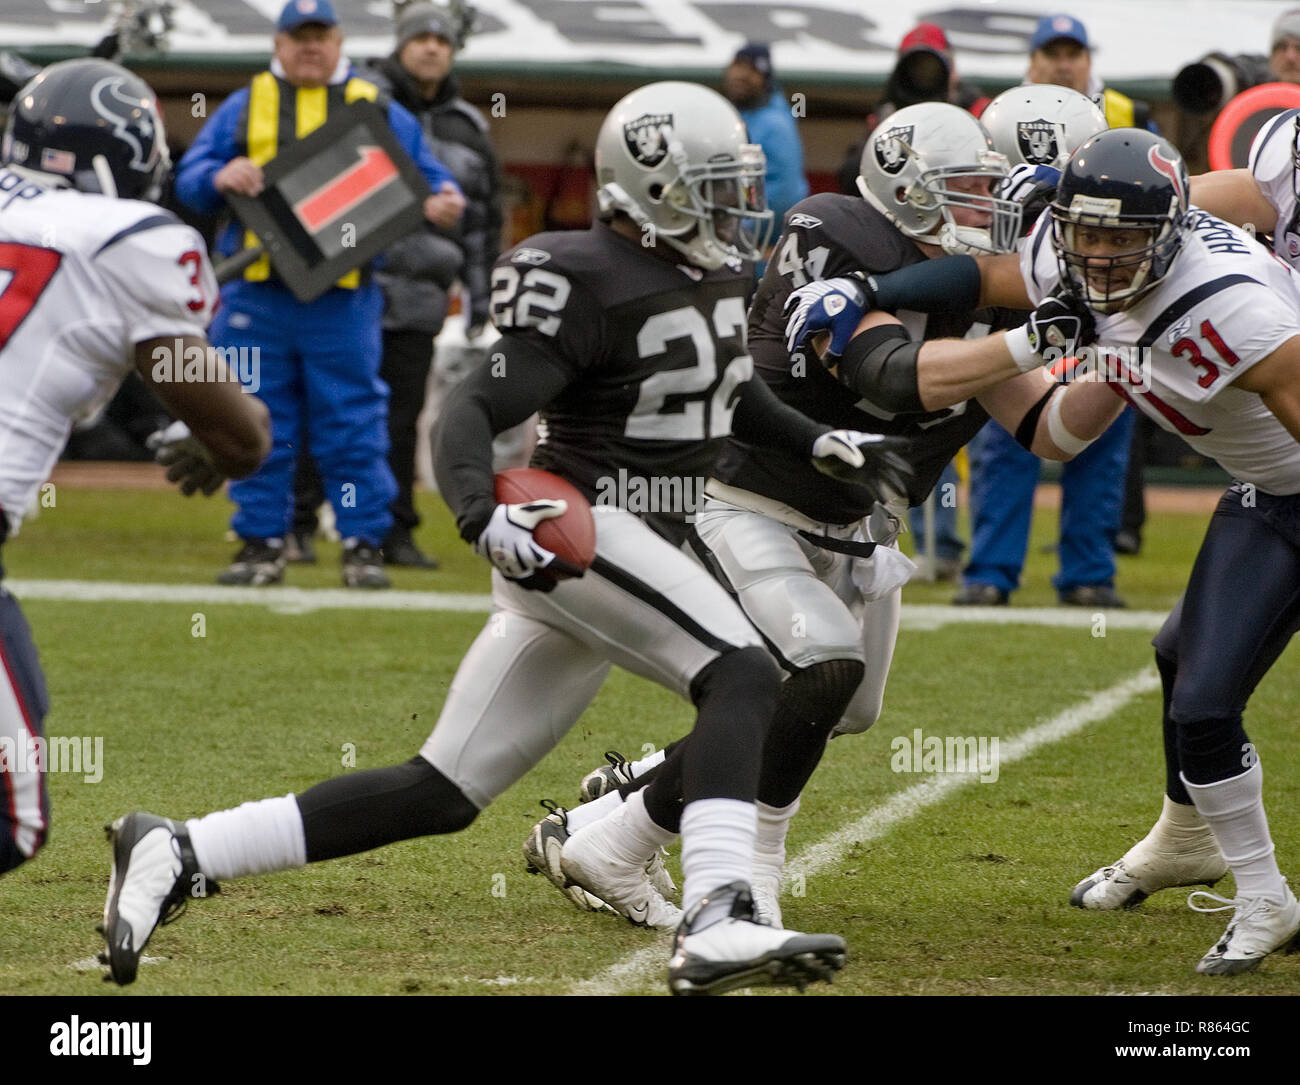 meet a6c86 66f50 21st Dec, 2008. Oakland Raiders cornerback Justin Miller